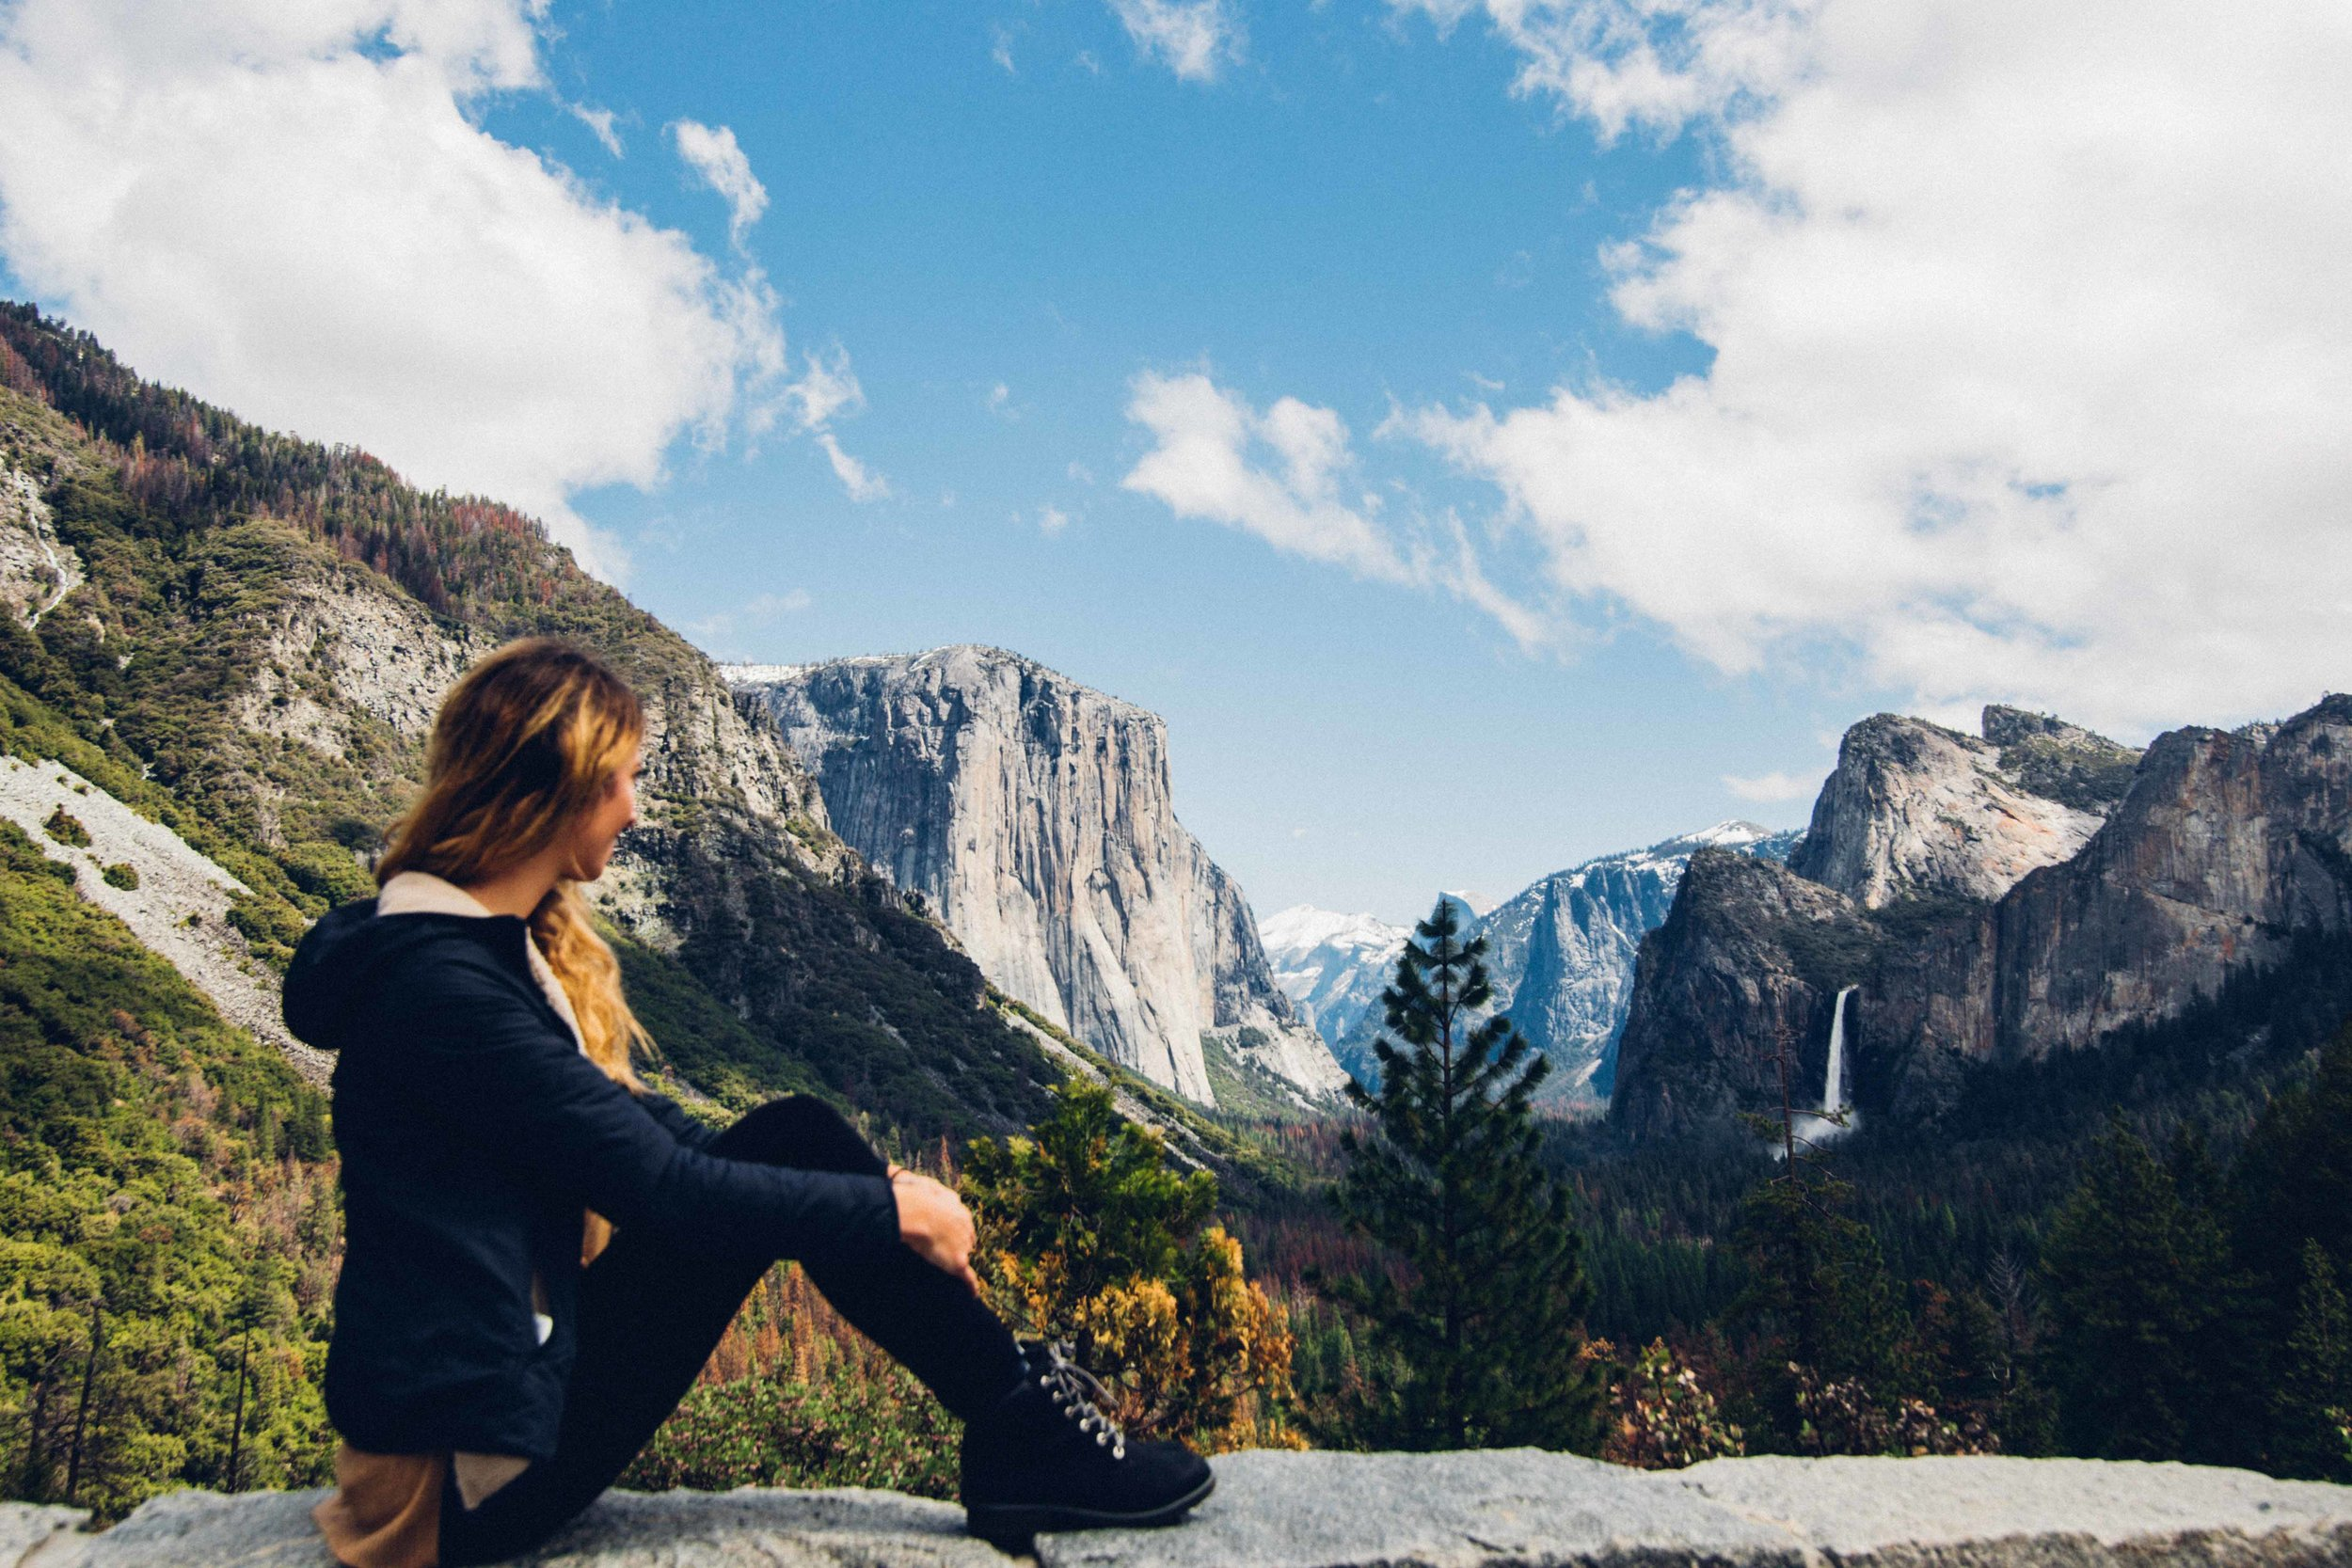 Yosemite-girl-travel-alone.jpg